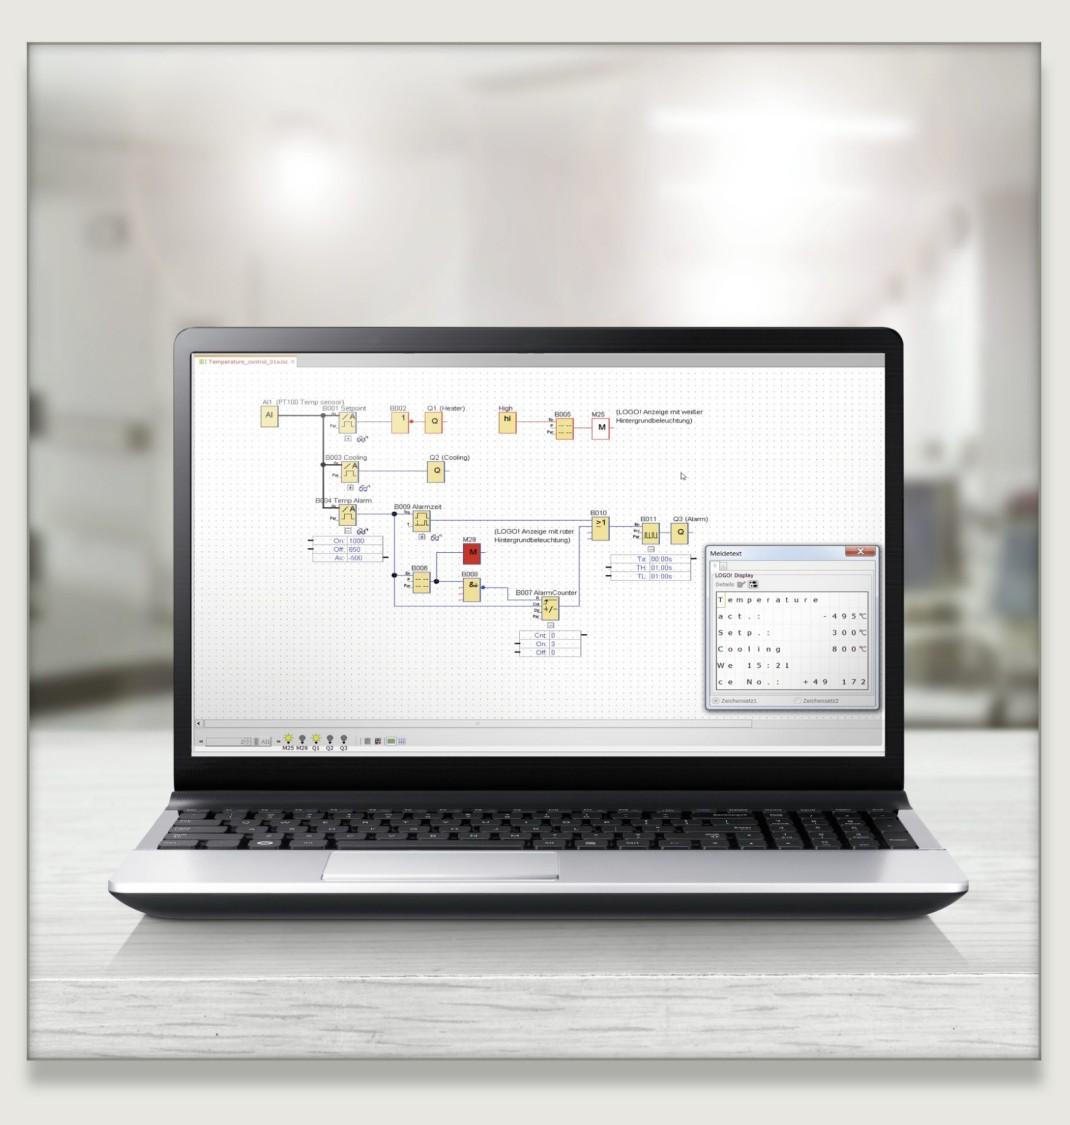 Demosoftware